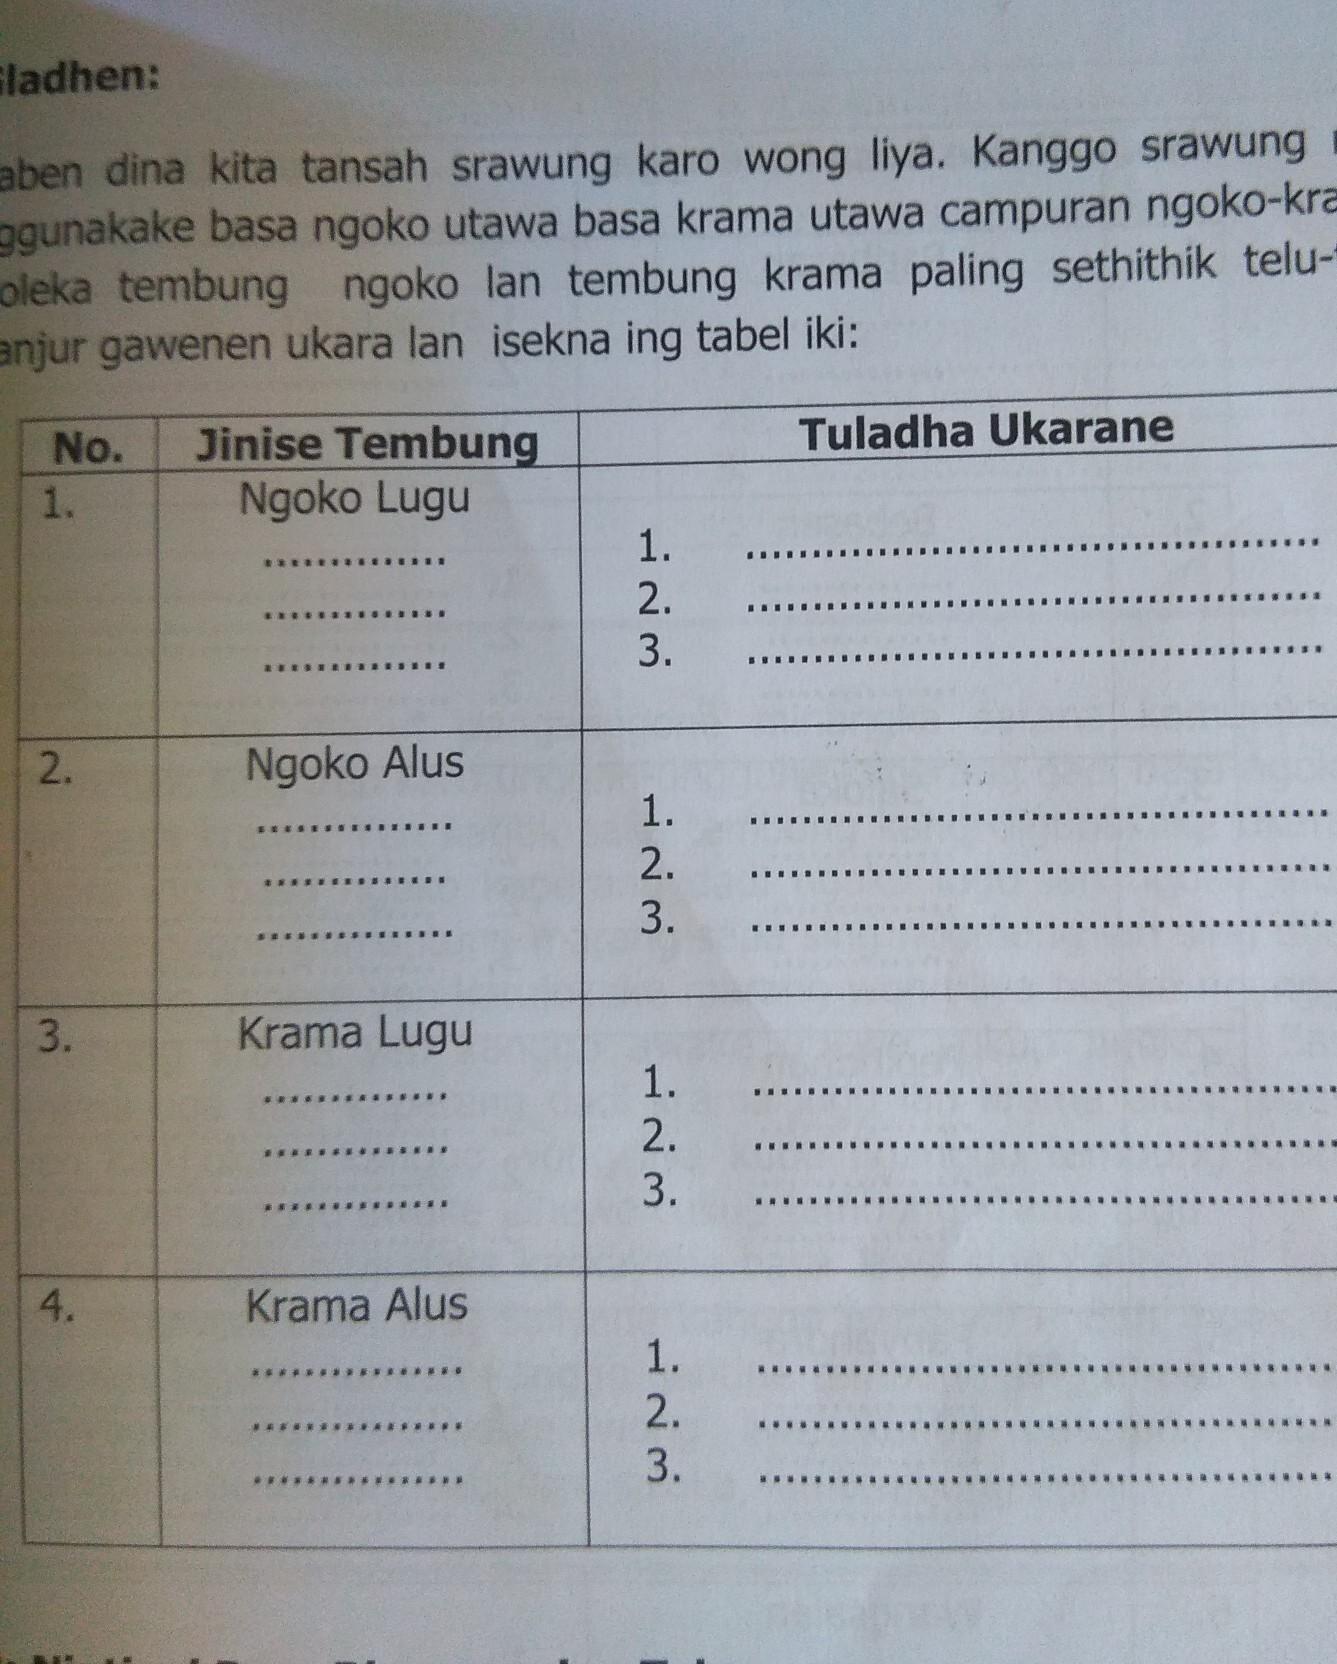 Jawaban Buku Paket Bahasa Jawa Halaman 37 Tolong Di Jawab Butuh Banget Brainly Co Id